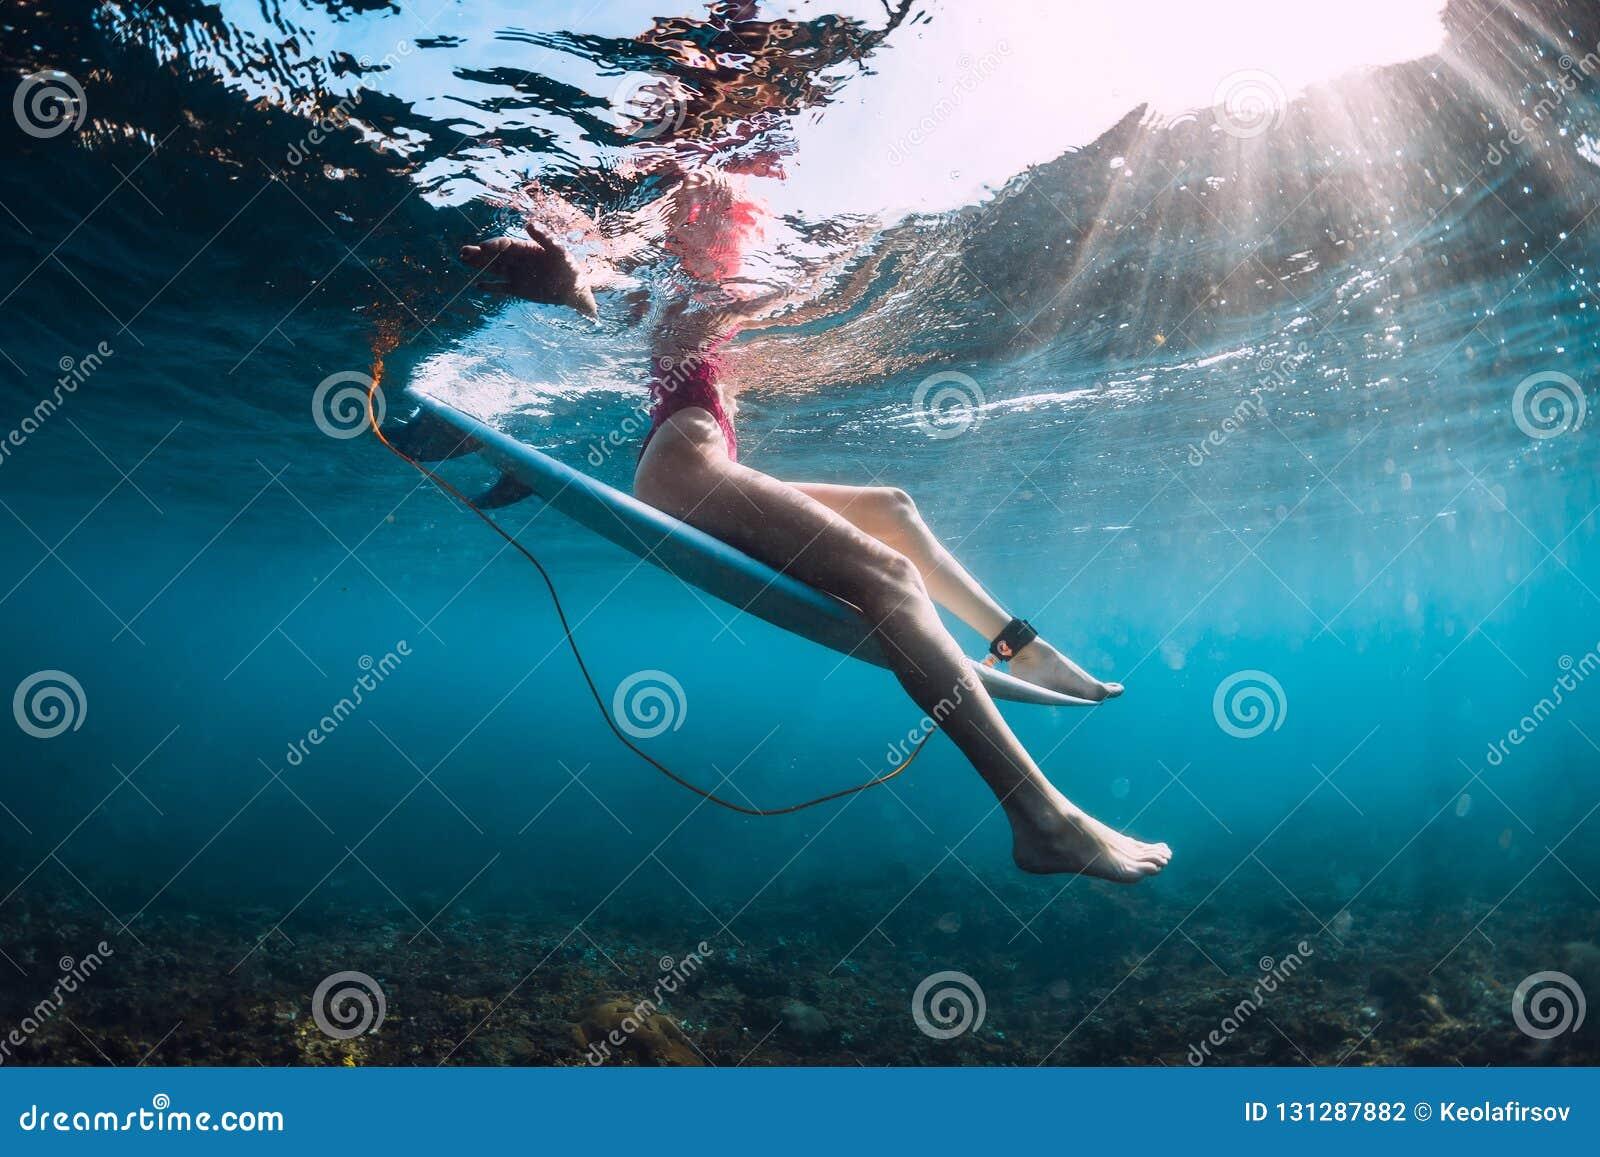 Attractive surfer girl sit at surfboard underwater in ocean